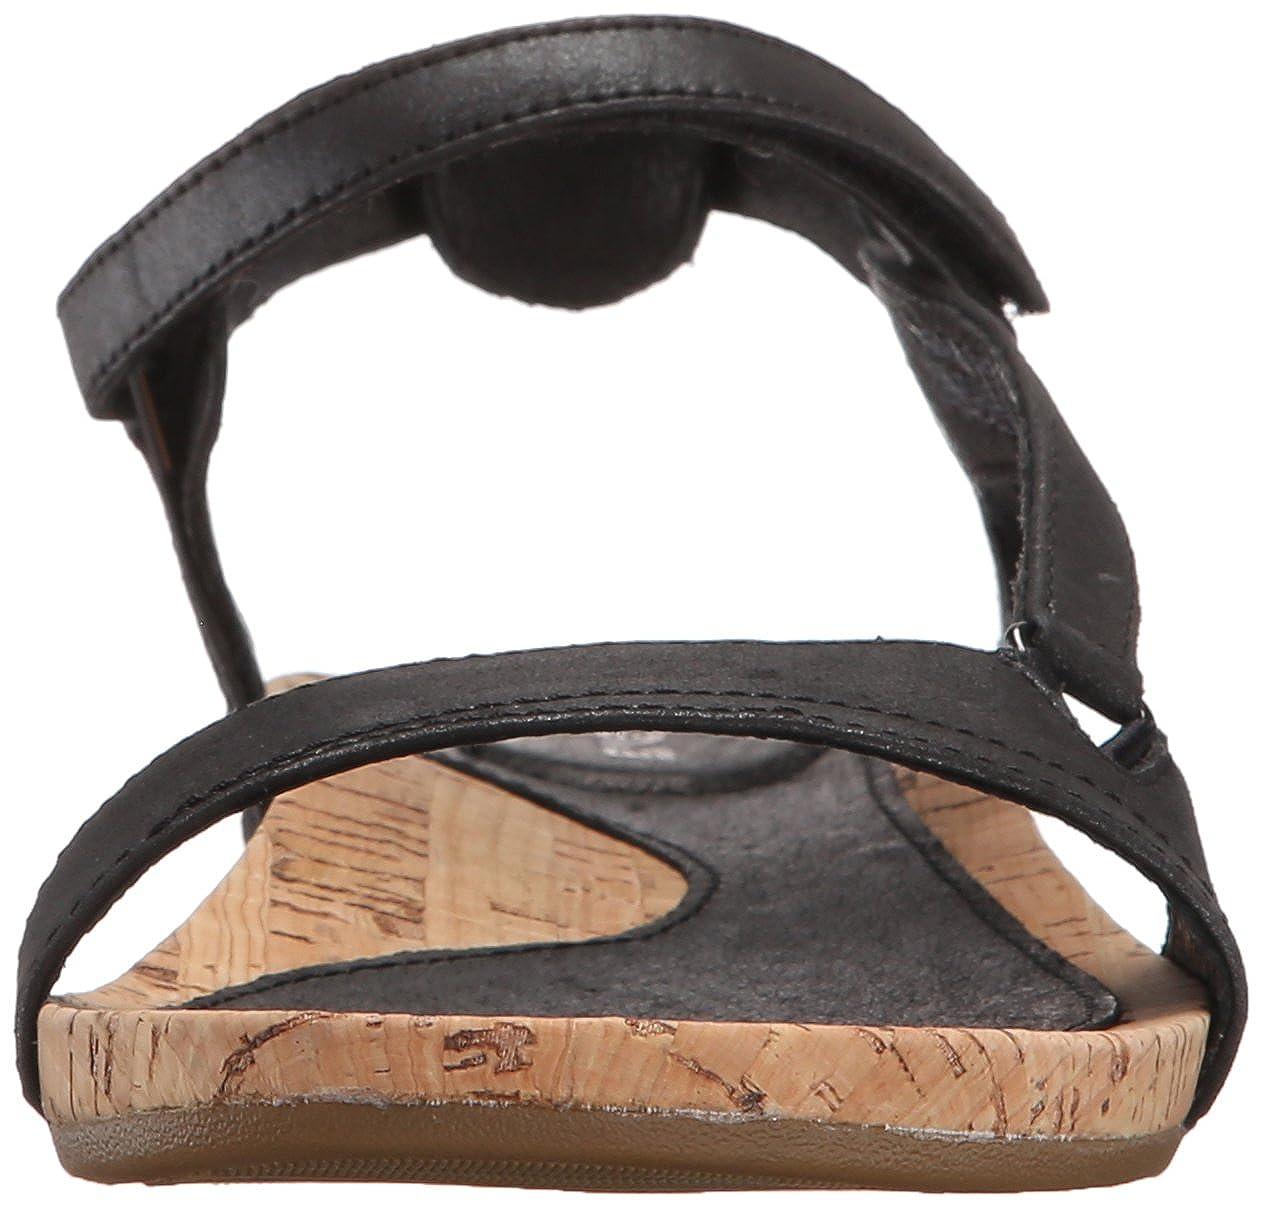 7df764df5a7ae Teva Women s W Capri Universal Heels Sandals  Amazon.co.uk  Shoes   Bags